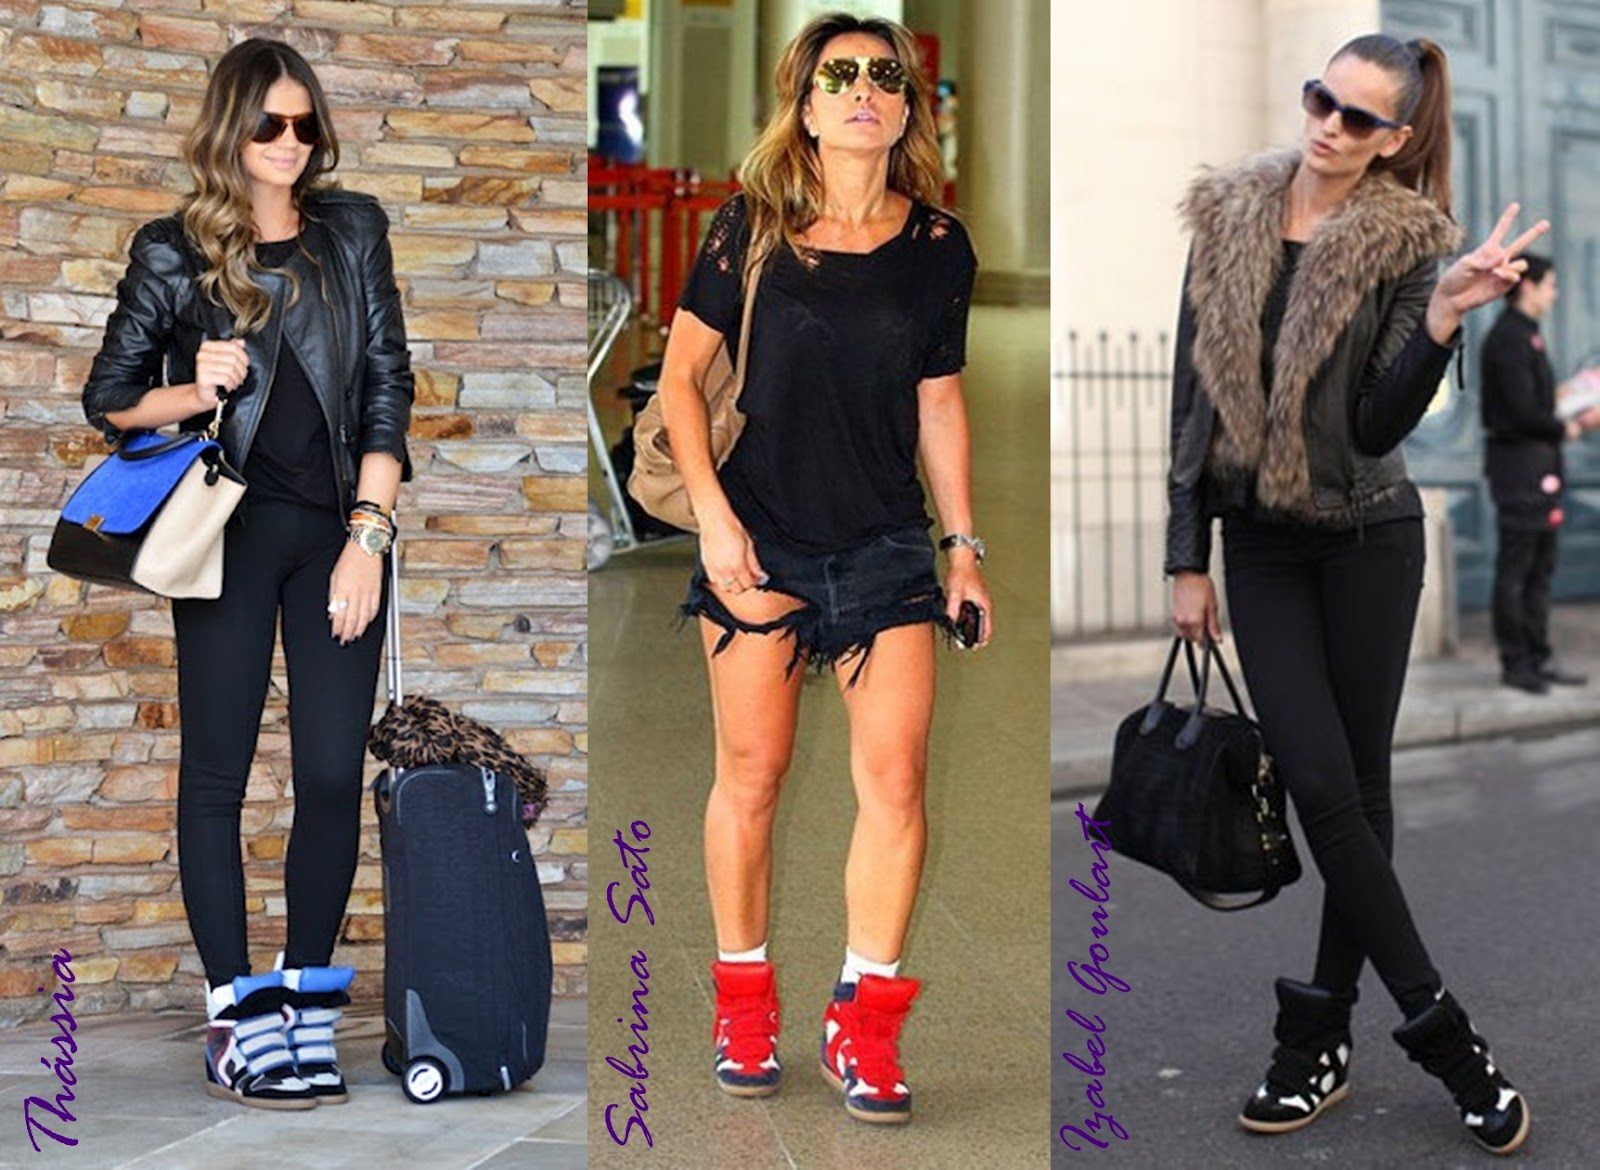 http://3.bp.blogspot.com/-cmF53EOkQTI/T8TXPgHnLZI/AAAAAAAABT0/pBjtt-RHuYM/s1600/brasil+sneakers.jpg